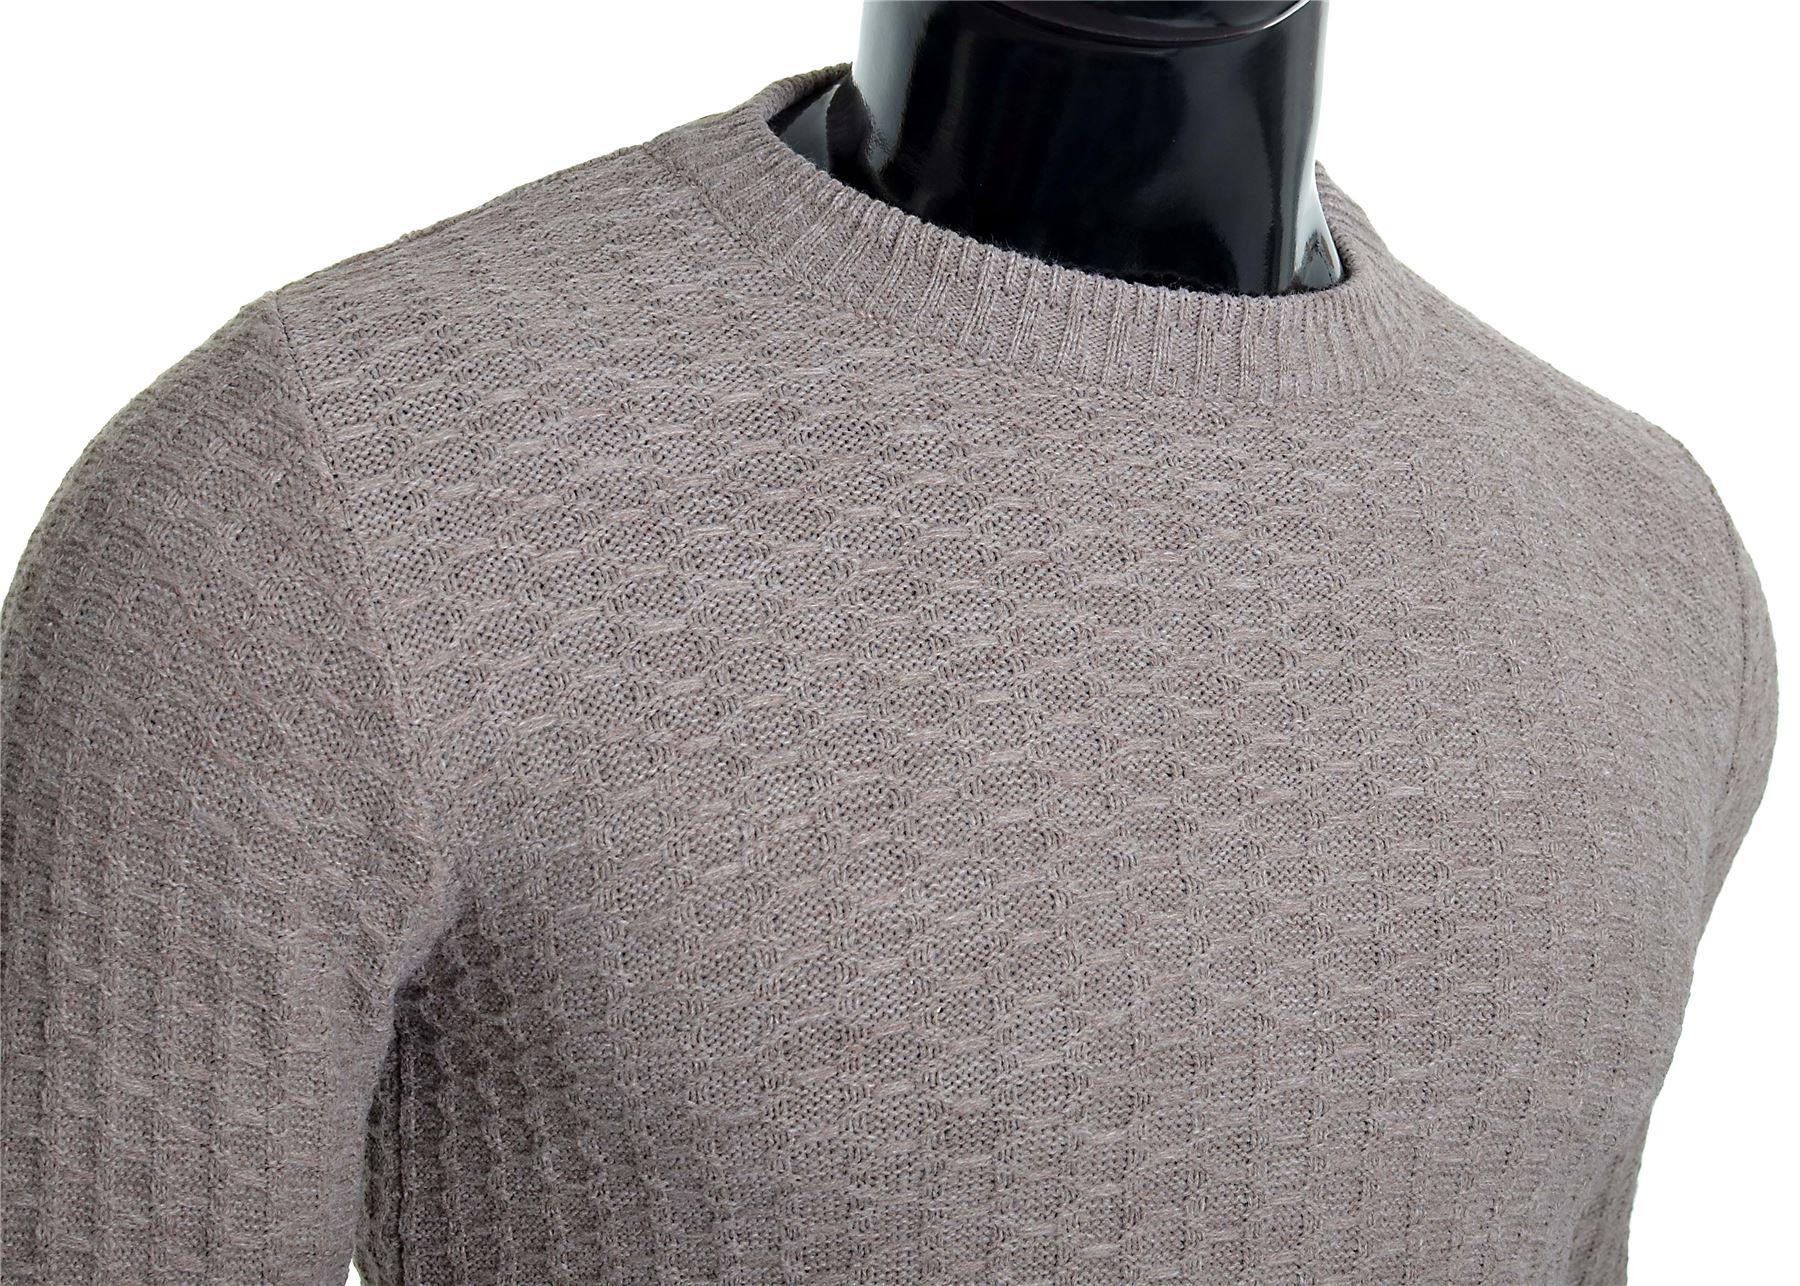 D-amp-R-Men-039-s-Wool-Knit-Jumper-Smart-Long-Sleeve-Sweater-Crew-Neck-Top thumbnail 4